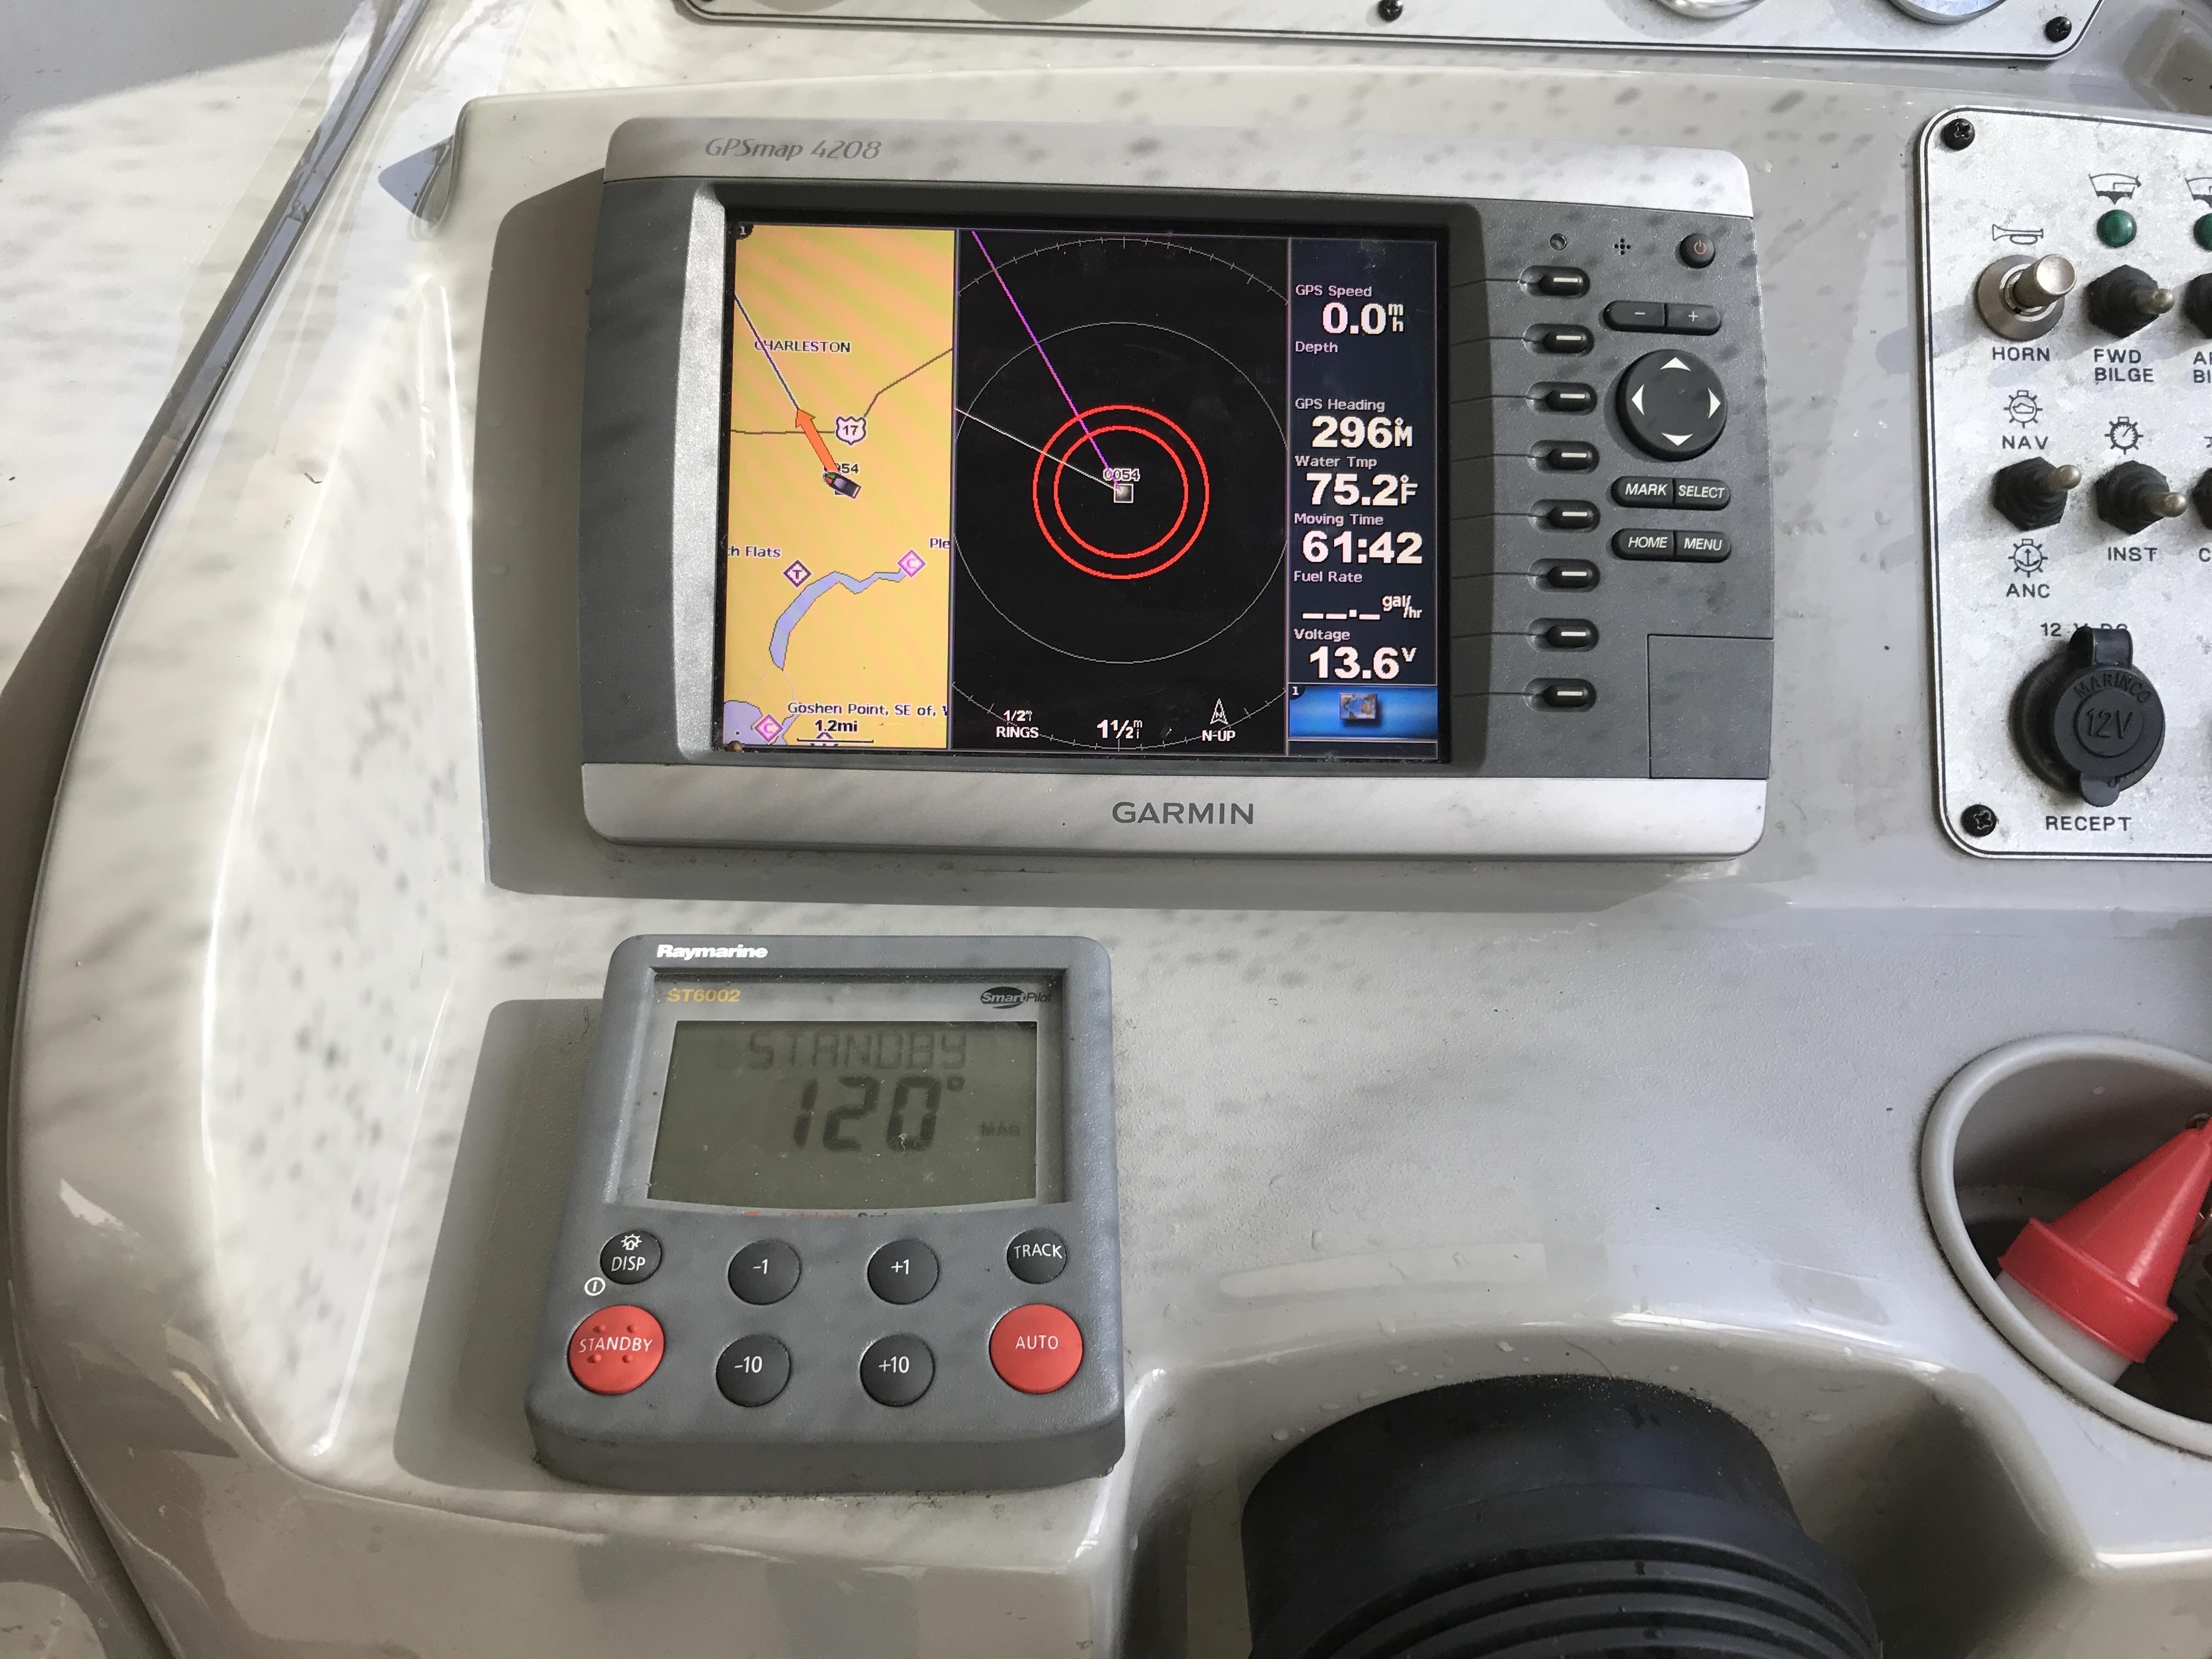 Bayliner Discovery 246 EC - Garmin GPS and Raymarine autopilot